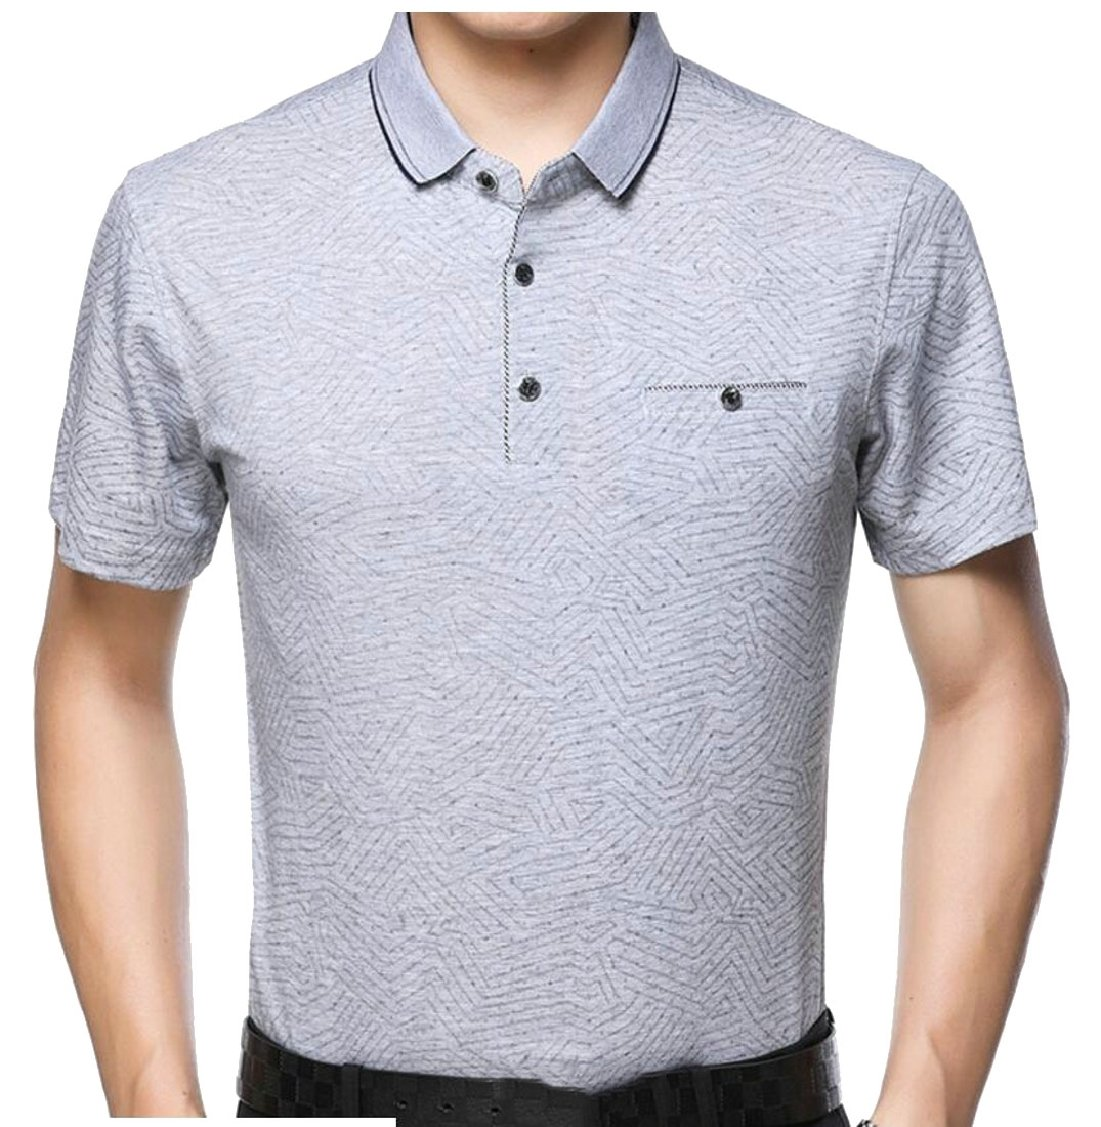 Jaycargogo Mens Summer Short Sleeve Classic Business Polo Shirt At